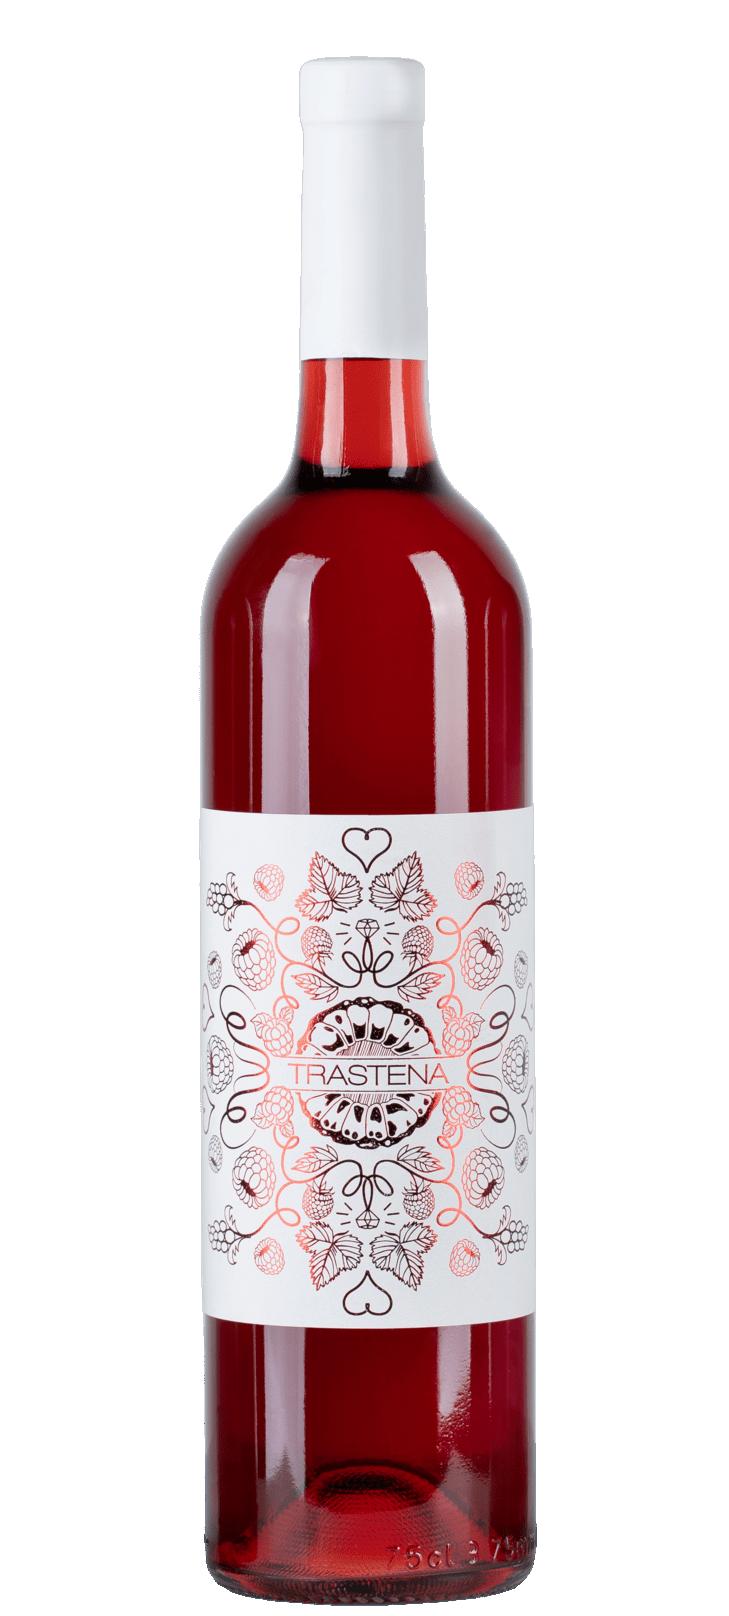 Трастена Малиново Розе 0.75 л